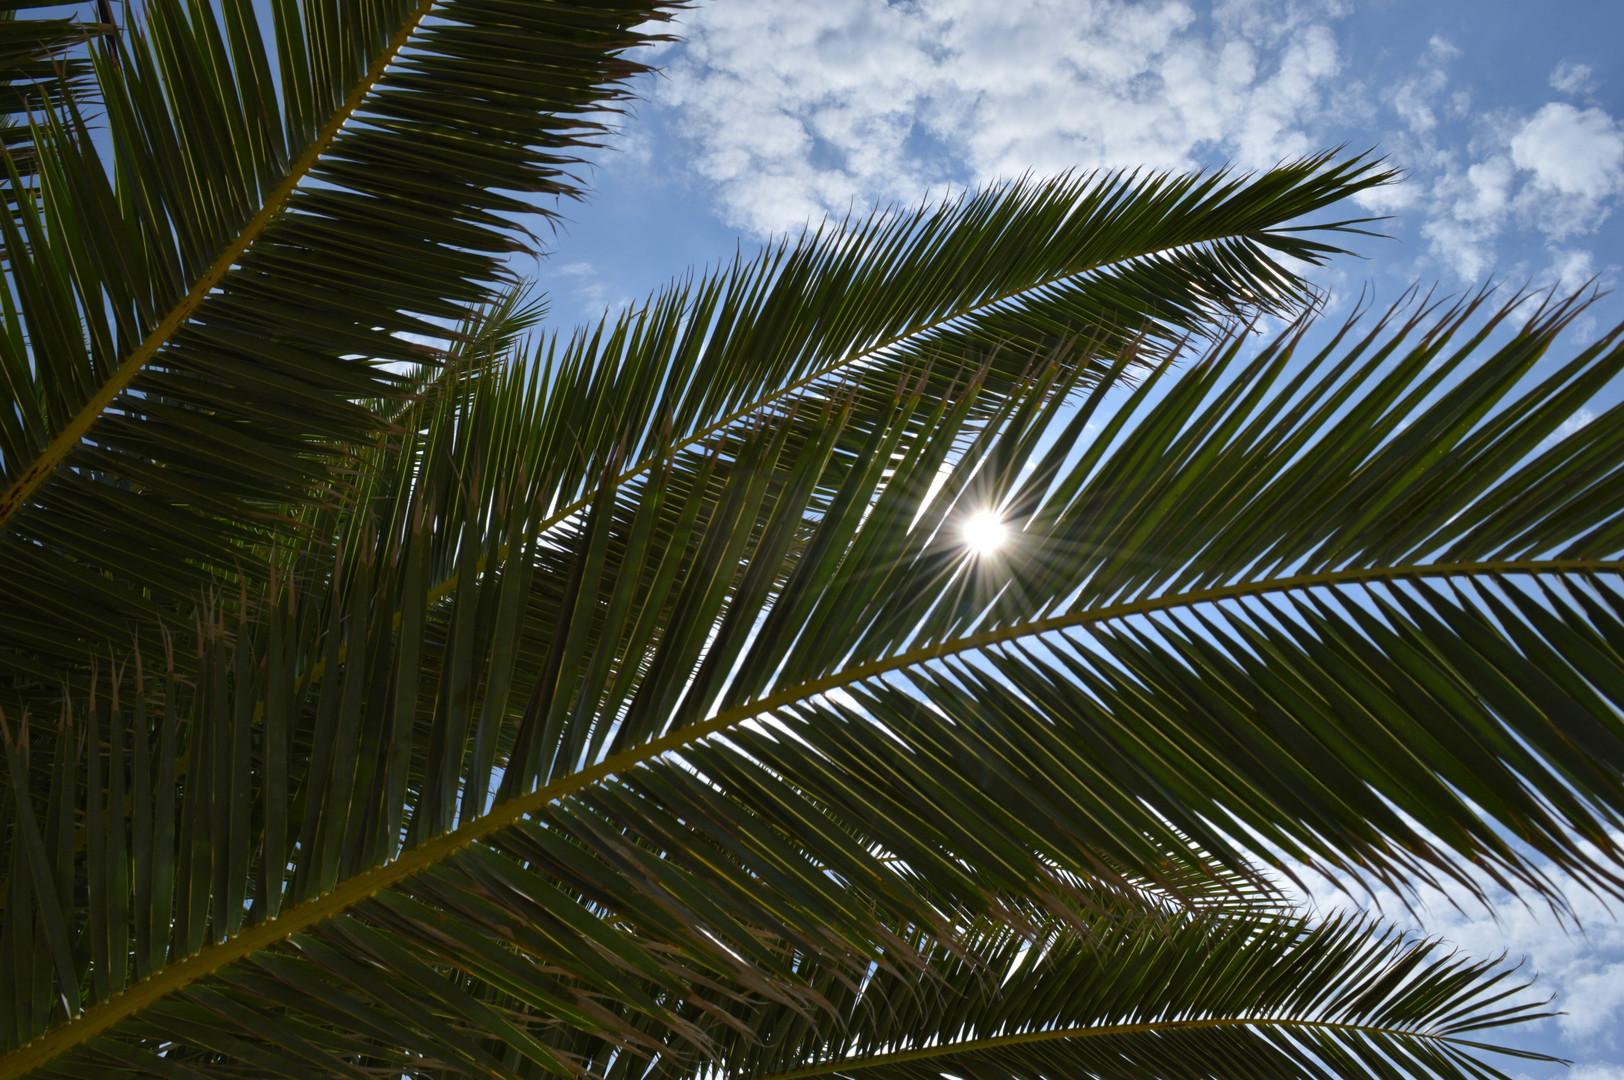 Palma i zraci sunca